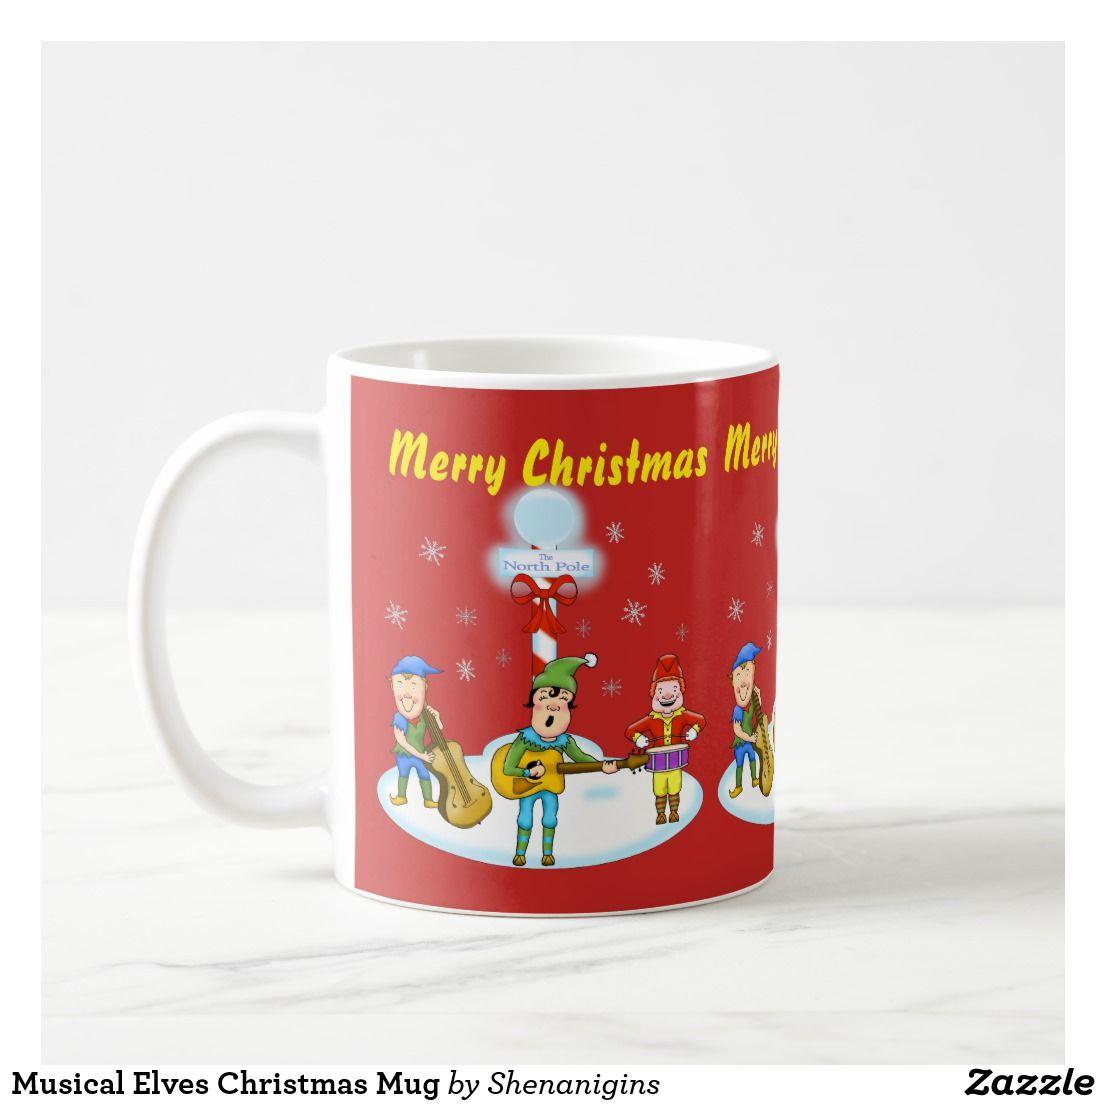 Musical Elves Christmas Mug | Christmas | Pinterest | Elves